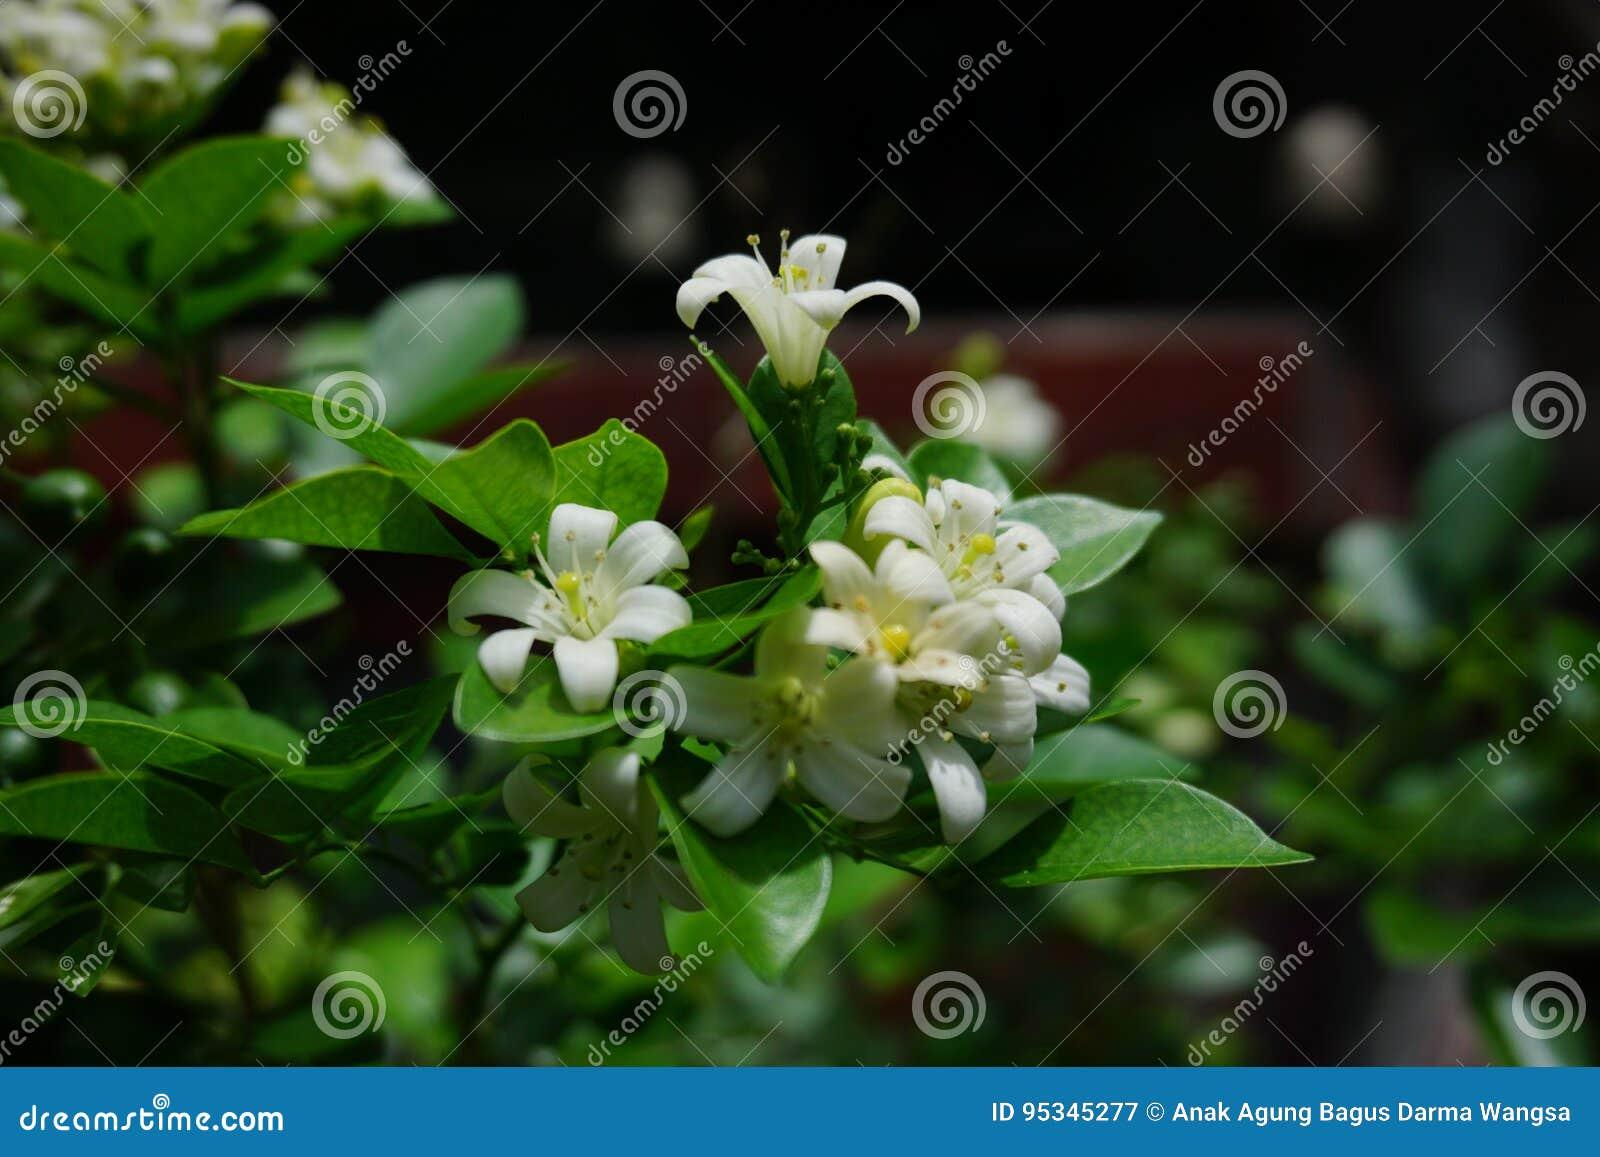 Jasmine In The Garden Stock Image Image Of Camera Passed 95345277